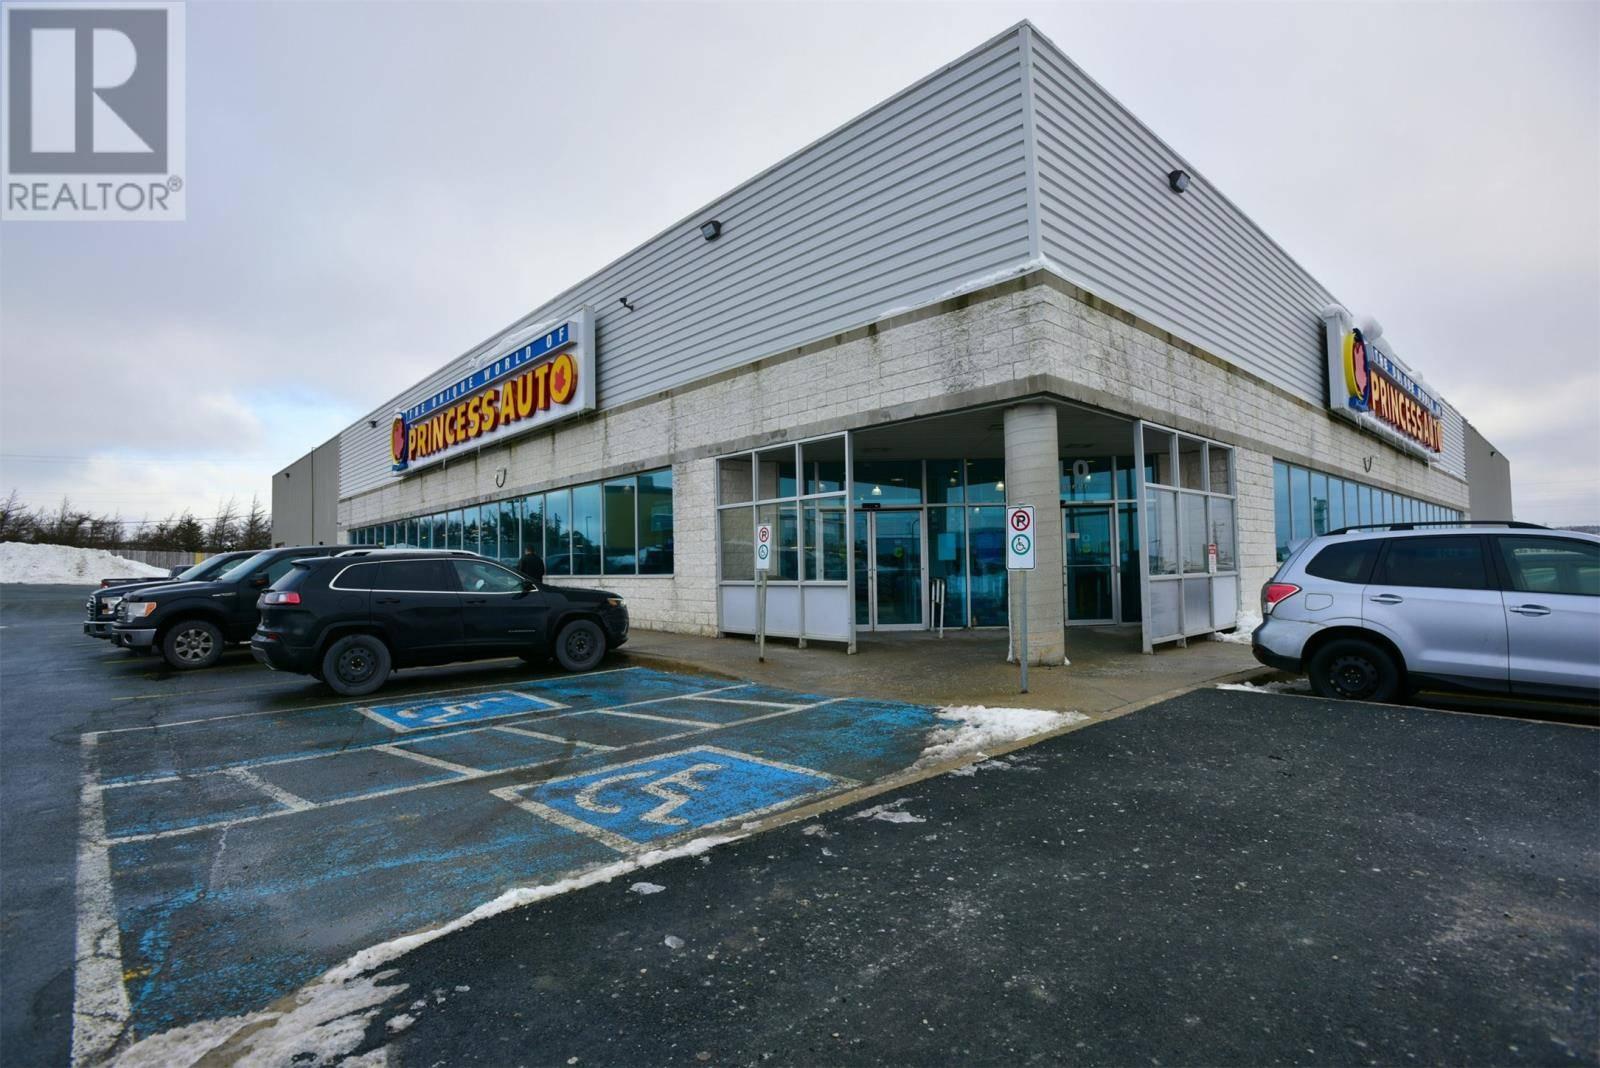 Residential property for sale at 410 Stavanger Dr St. John's Newfoundland - MLS: 1209510